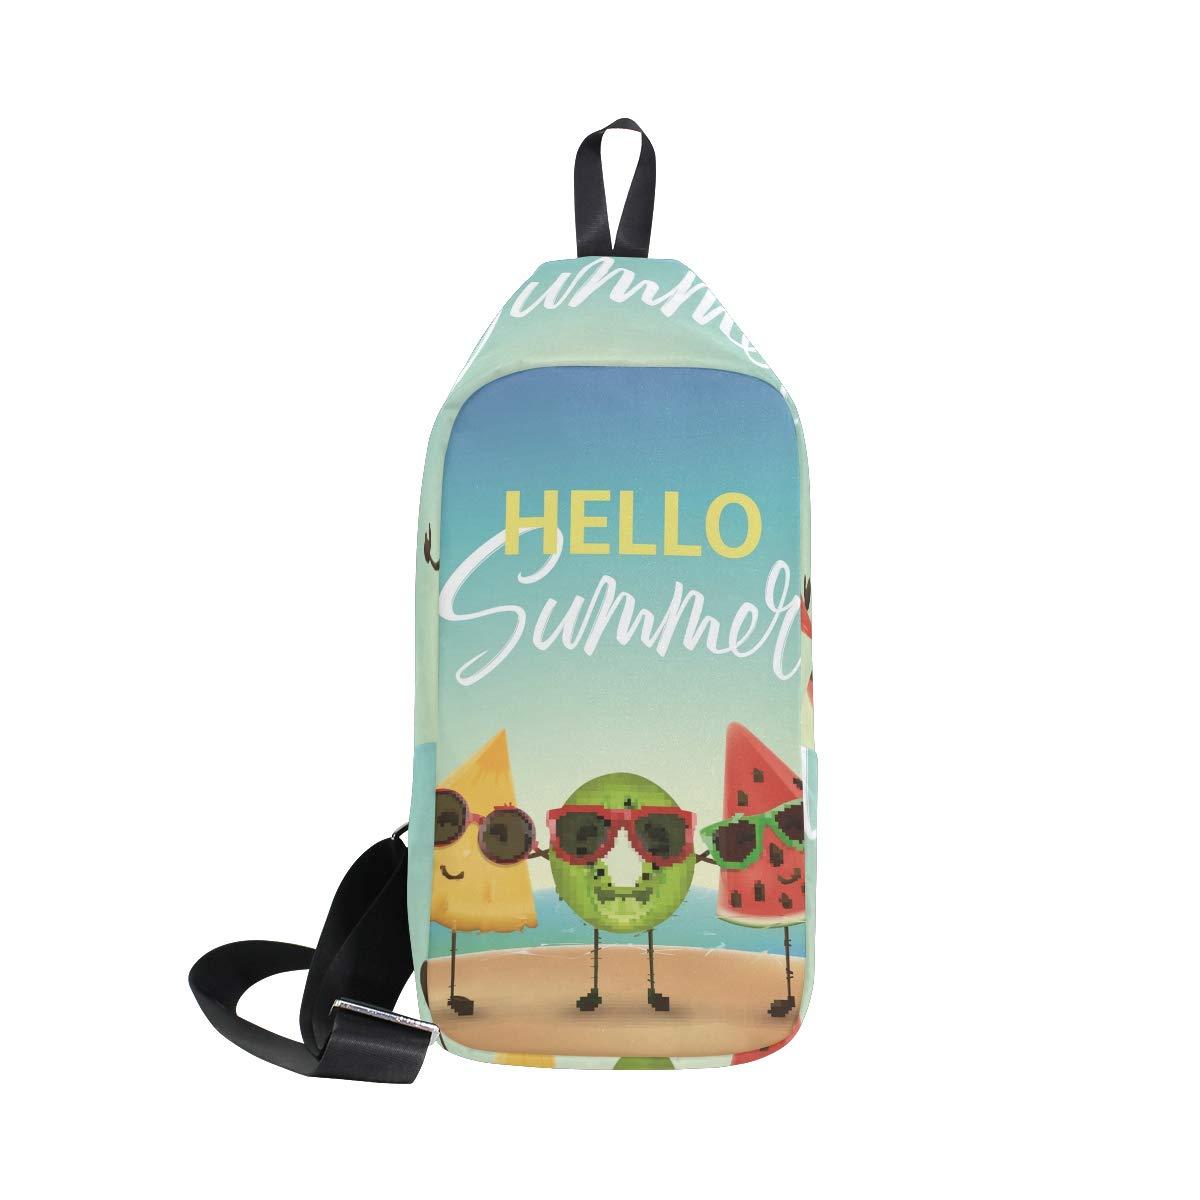 AHOMY Summer Cartoon Watermelon Kiwi And Pineapple Messenger Bag Small Travel School Sling Bag Crossbody Bag